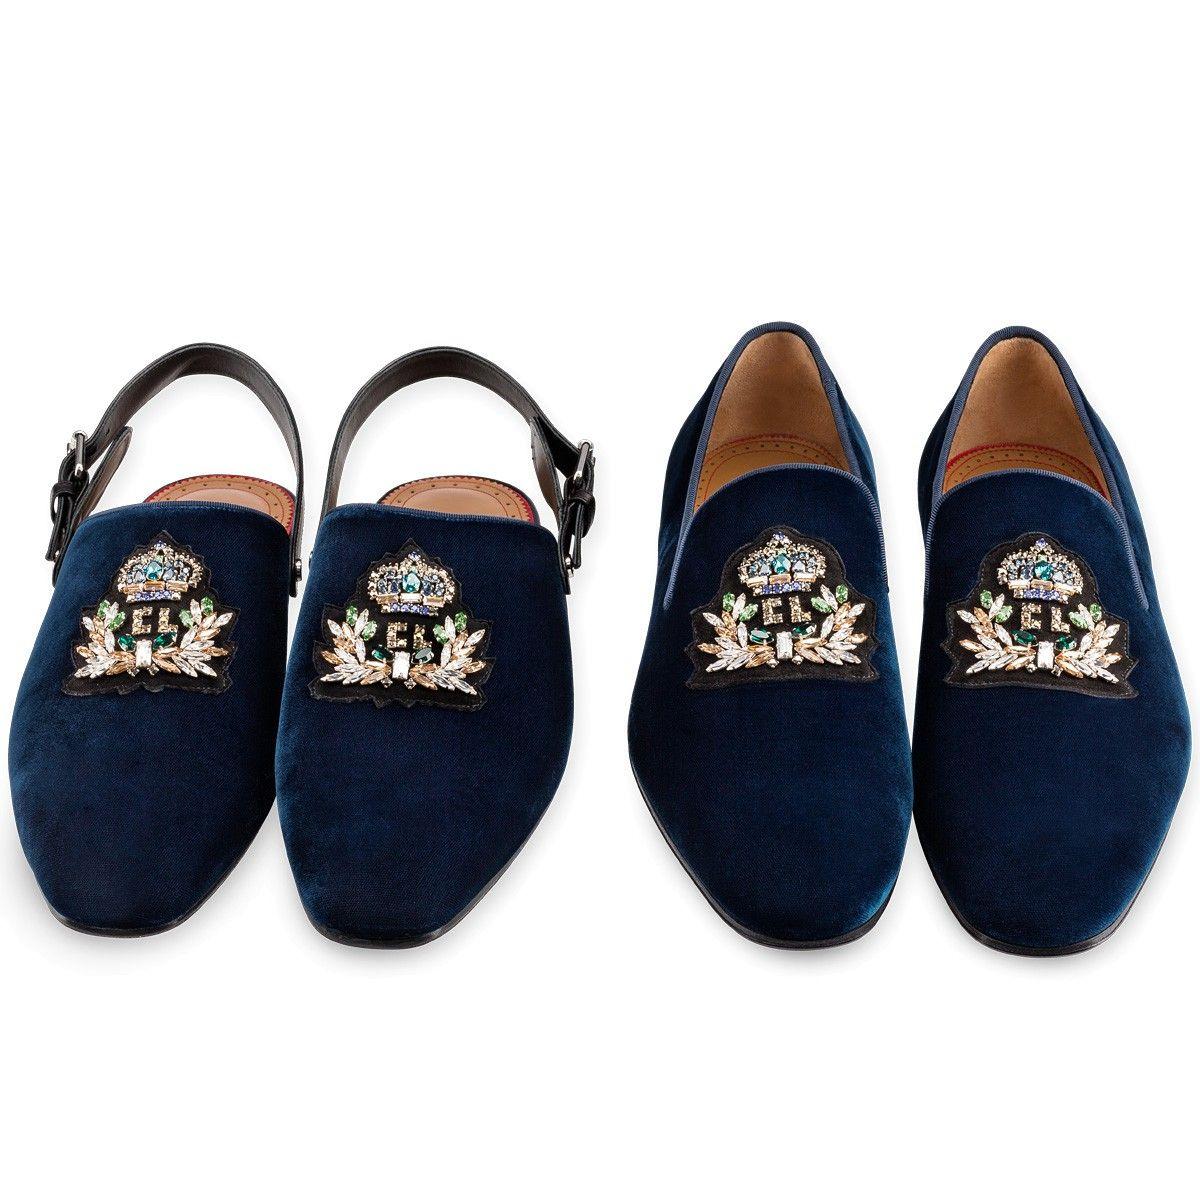 8daa1fc9908 Shoes - Logo Dandelion Flat - Christian Louboutin   Loafers/Slippers ...